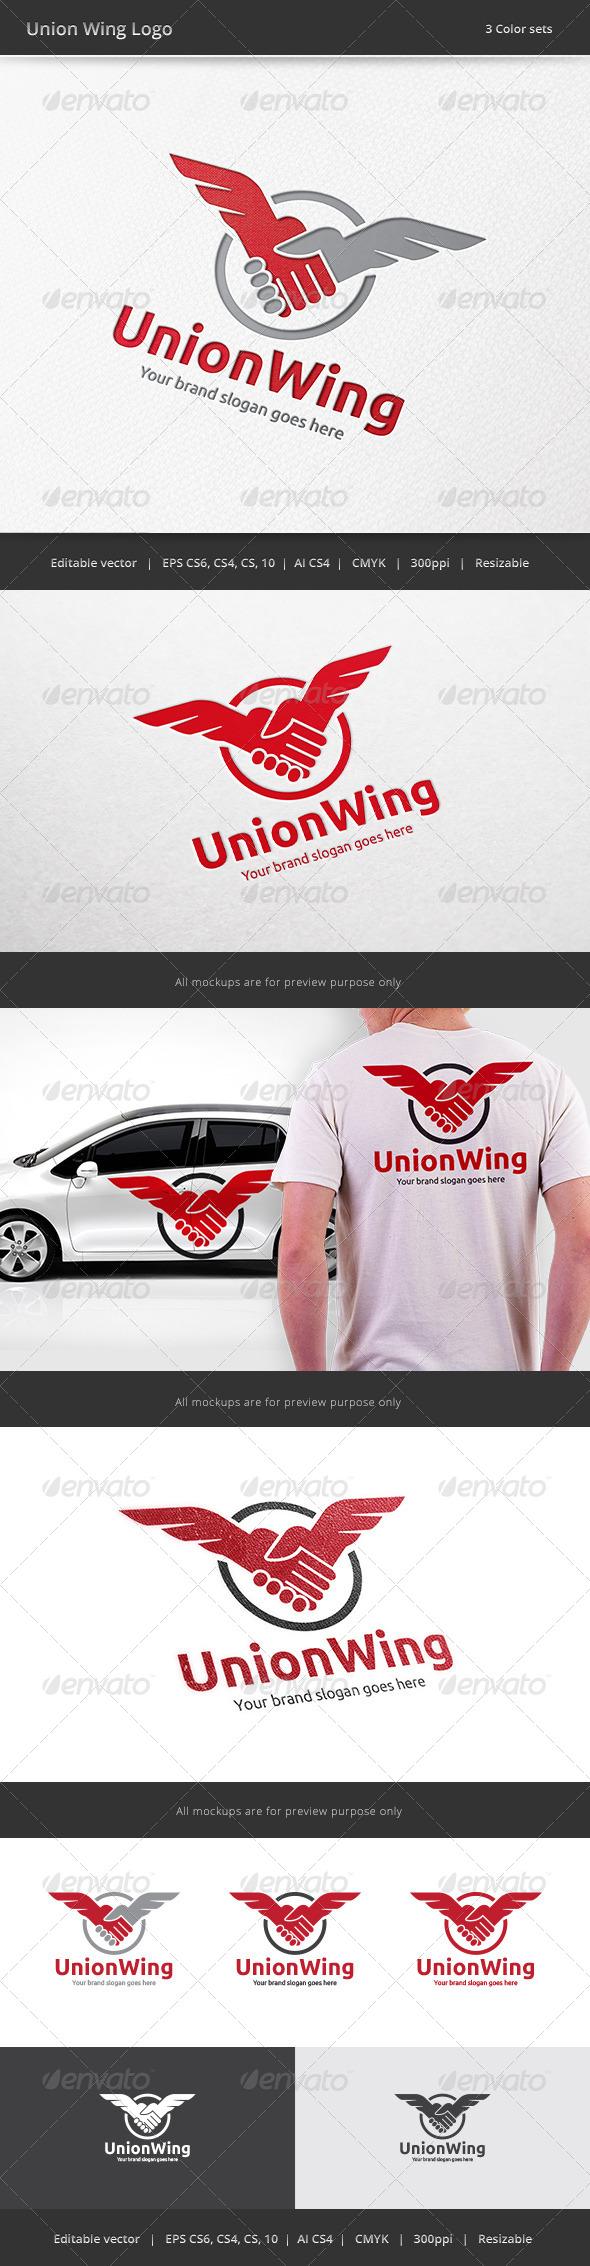 GraphicRiver Union Wing Logo 7899741